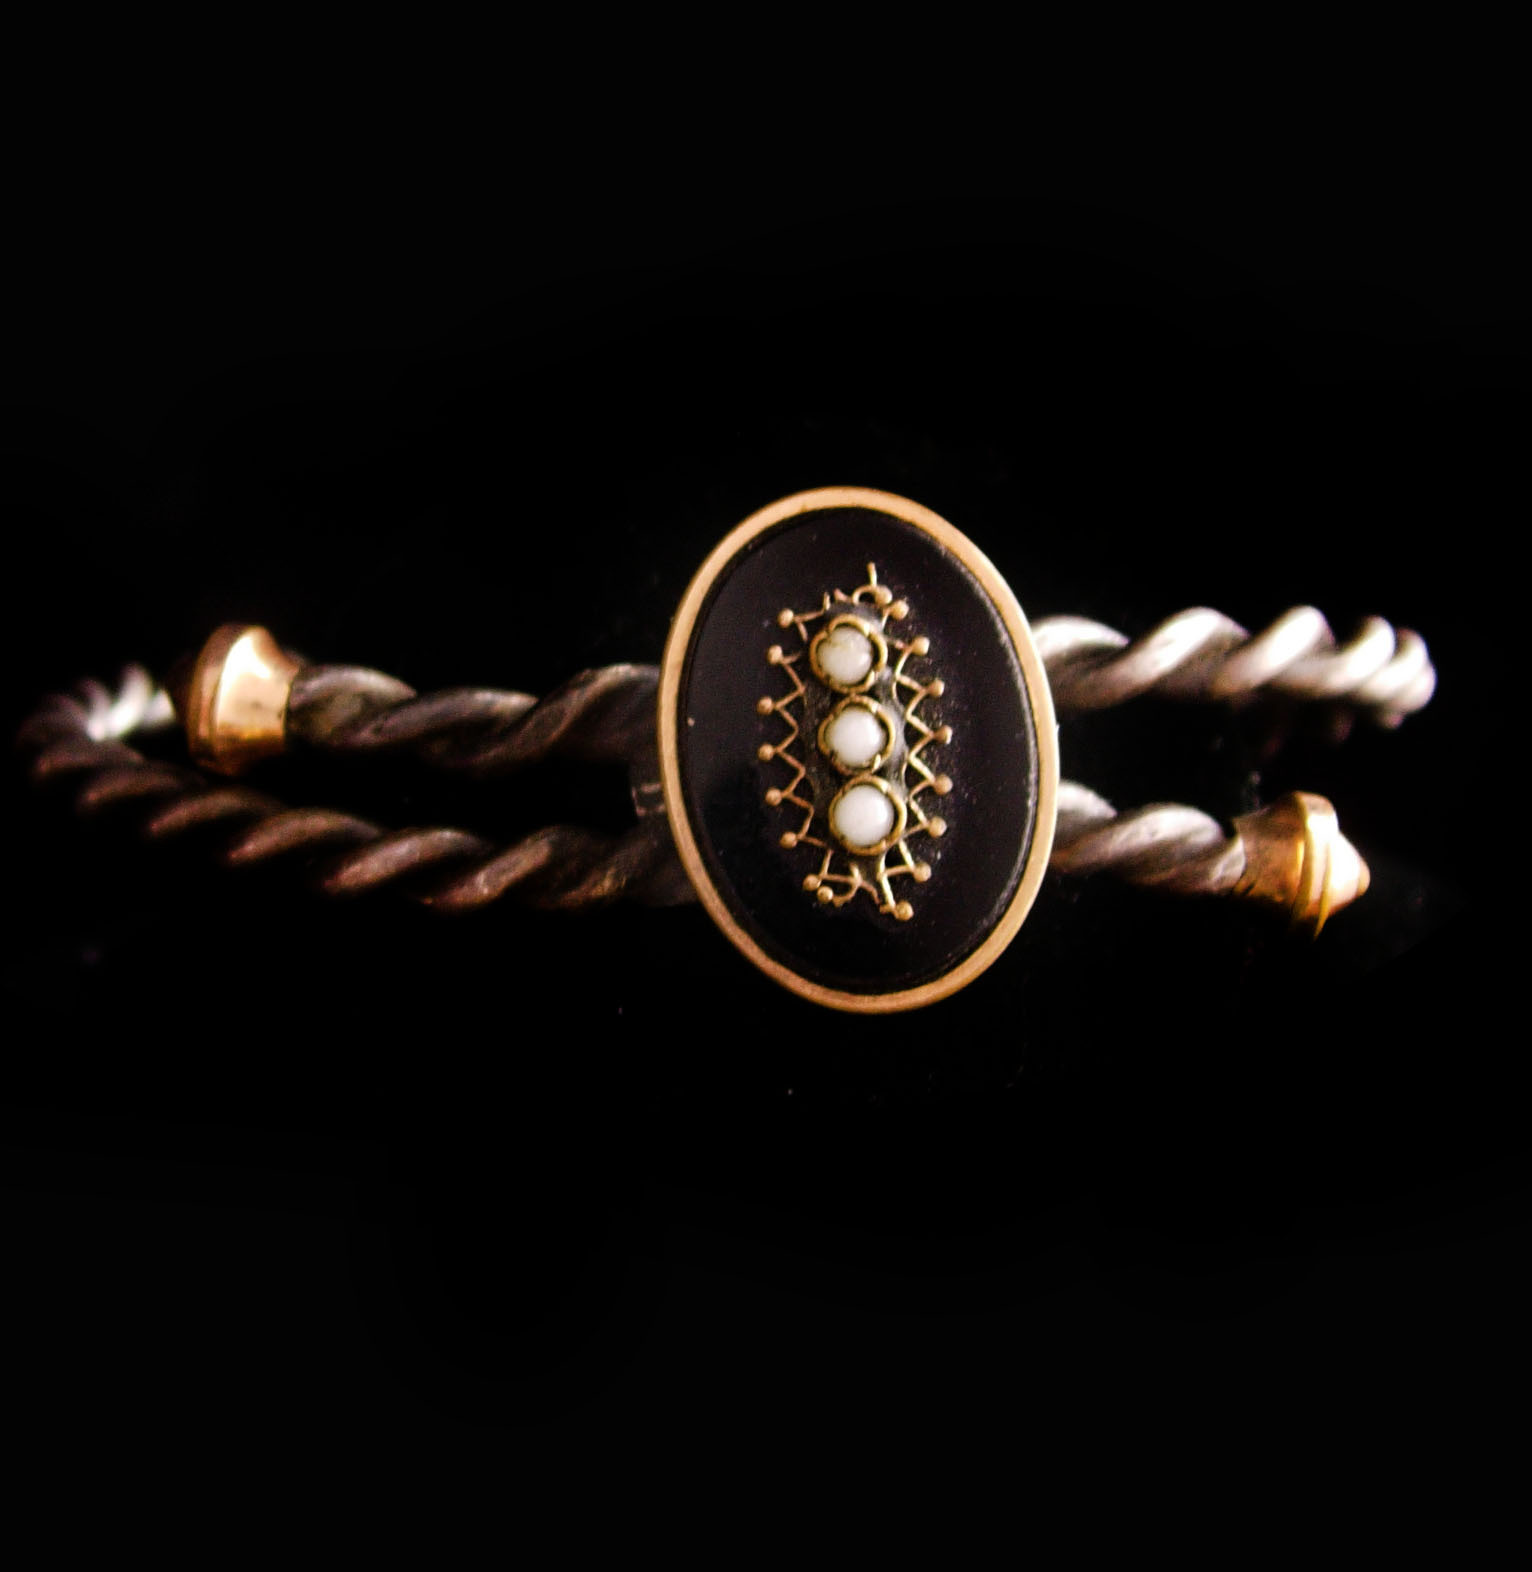 1879 Victorian seed pearl Bracelet - vintage ornate gold metal work - Antique ro